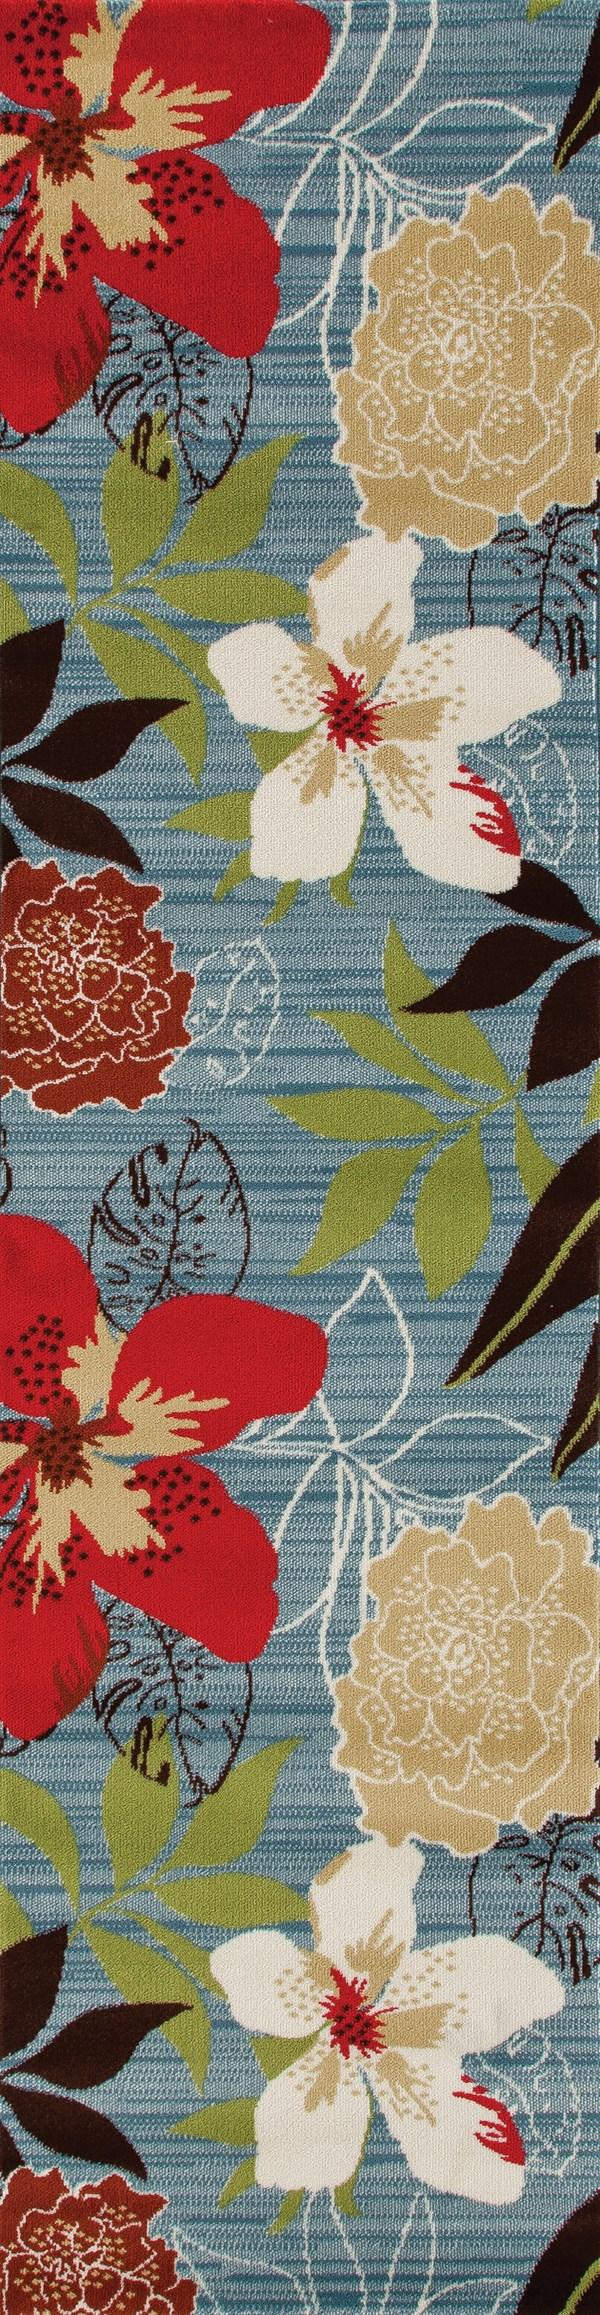 Aqua, Red, Cream (ARO-011) Floral / Botanical Area Rug